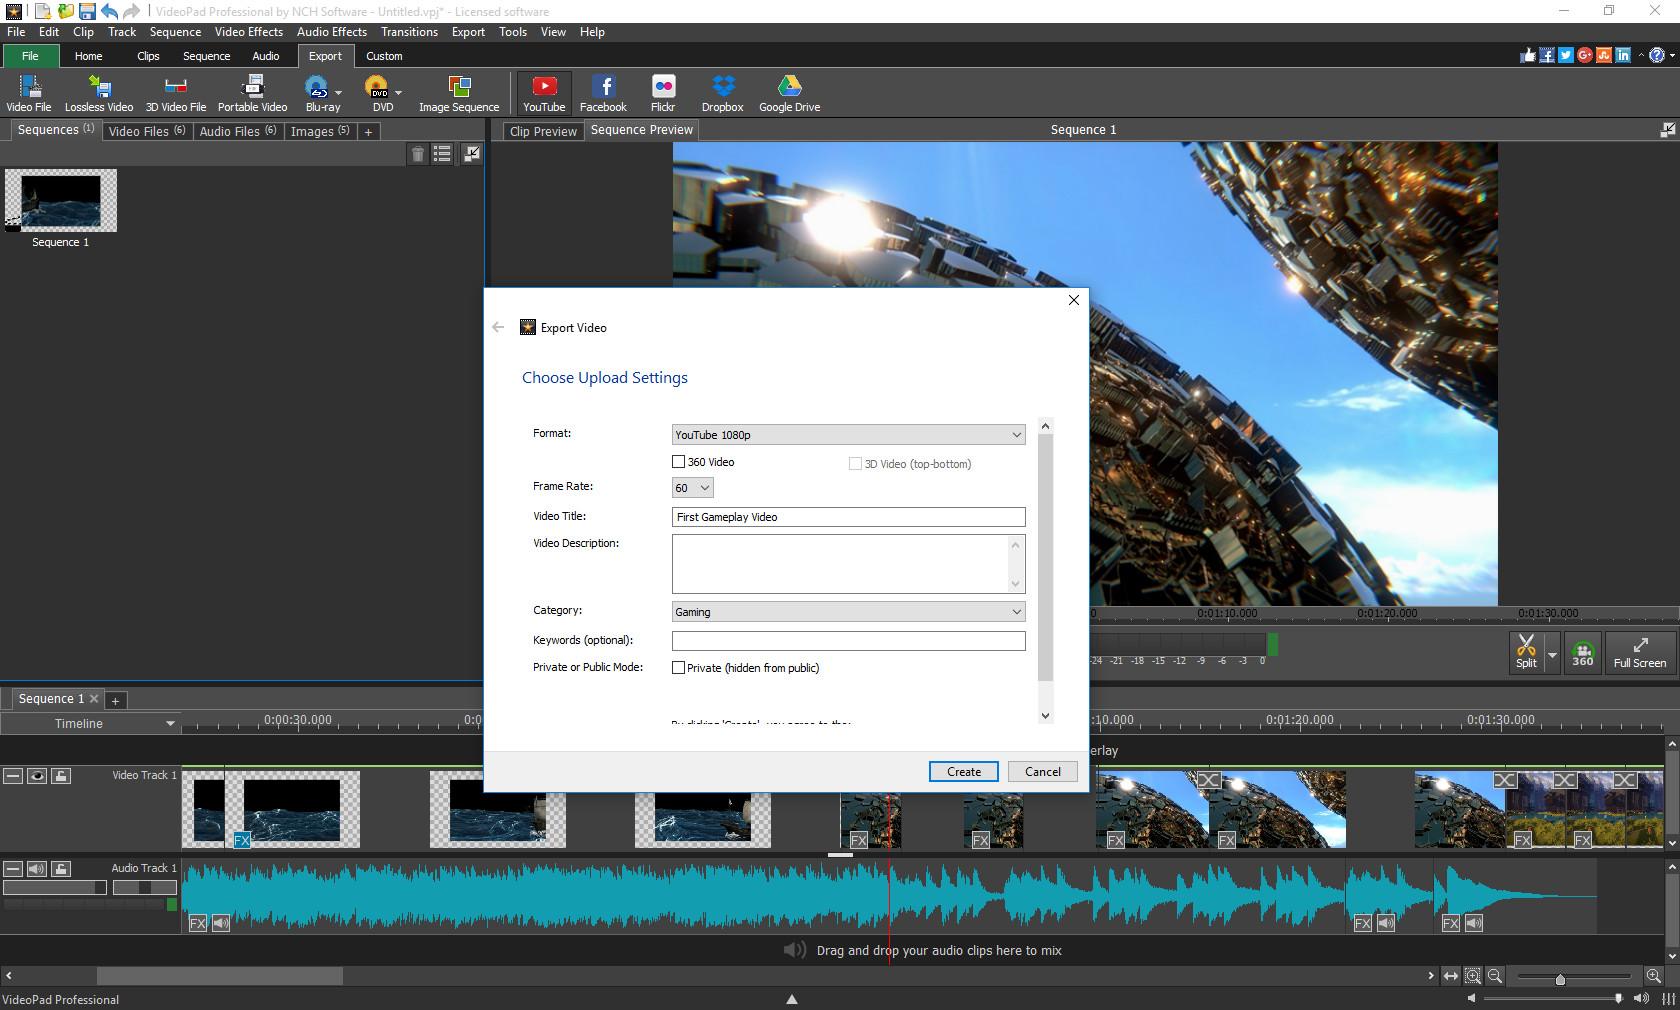 videopad video editor price